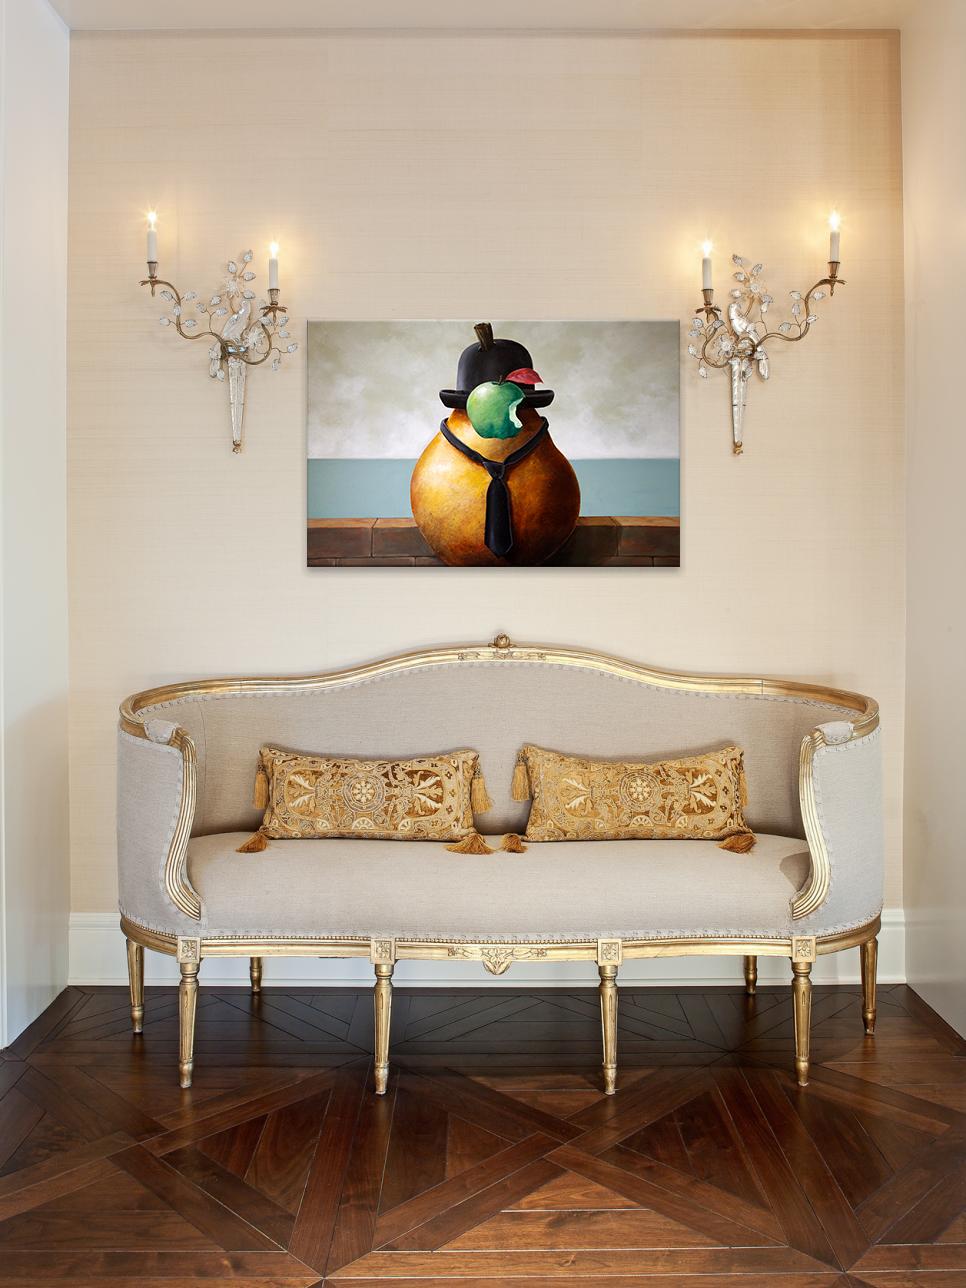 interior-design-artwork-on-wallinterior-design-artwork-on-wall-appetite-bill-higginson.jpg